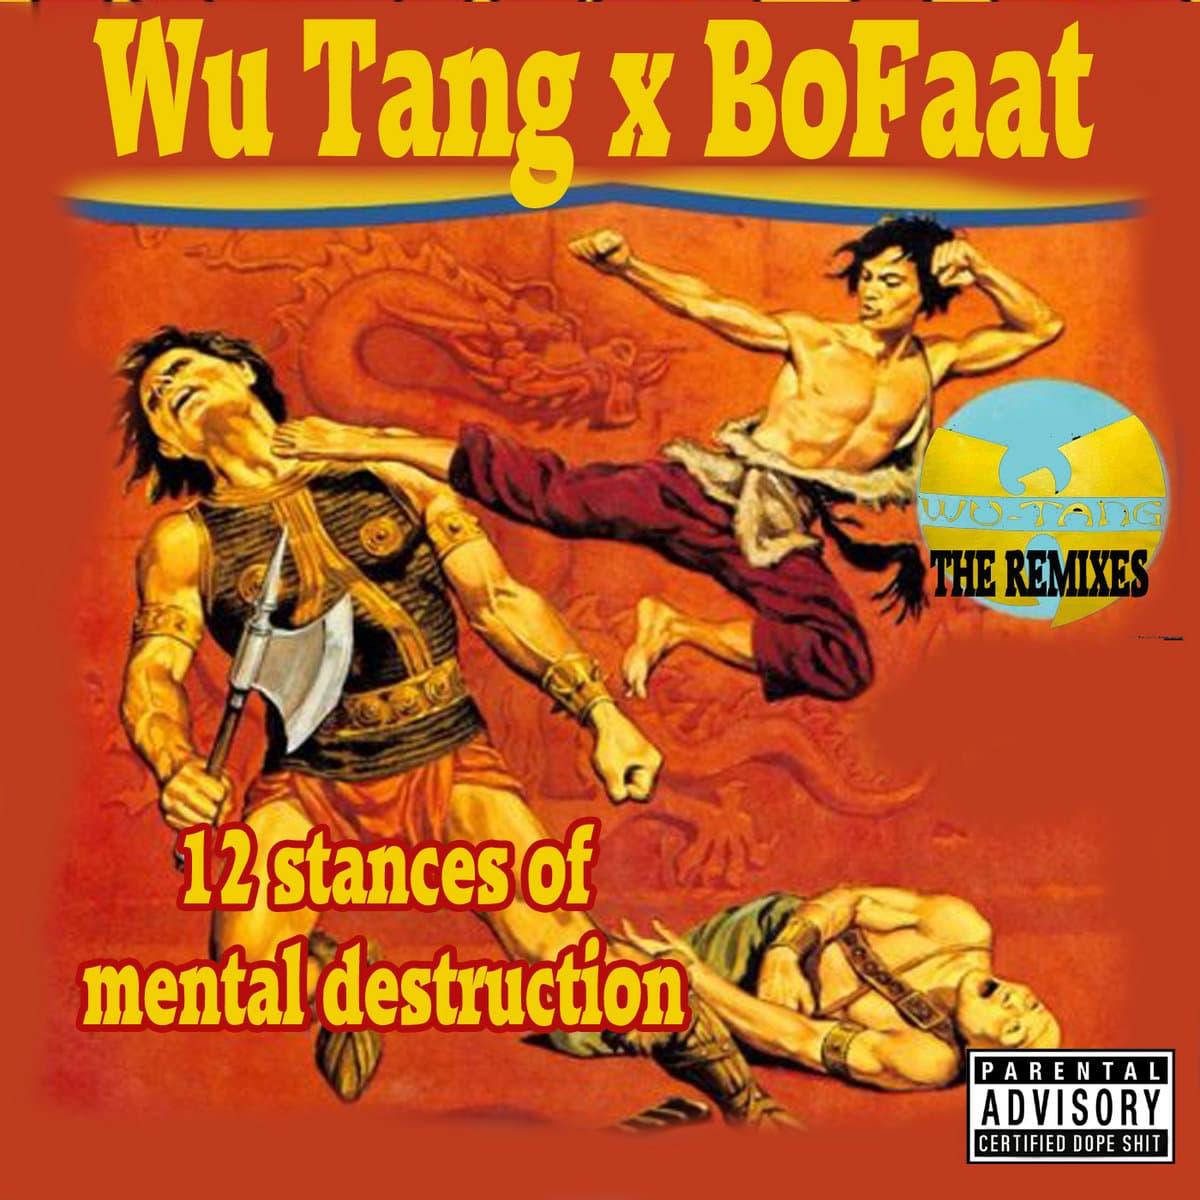 Wu Tang x BoFaat - Twelve Stances Of Mental Destruction   Remix Tape vom Producer BoFaatBeatz